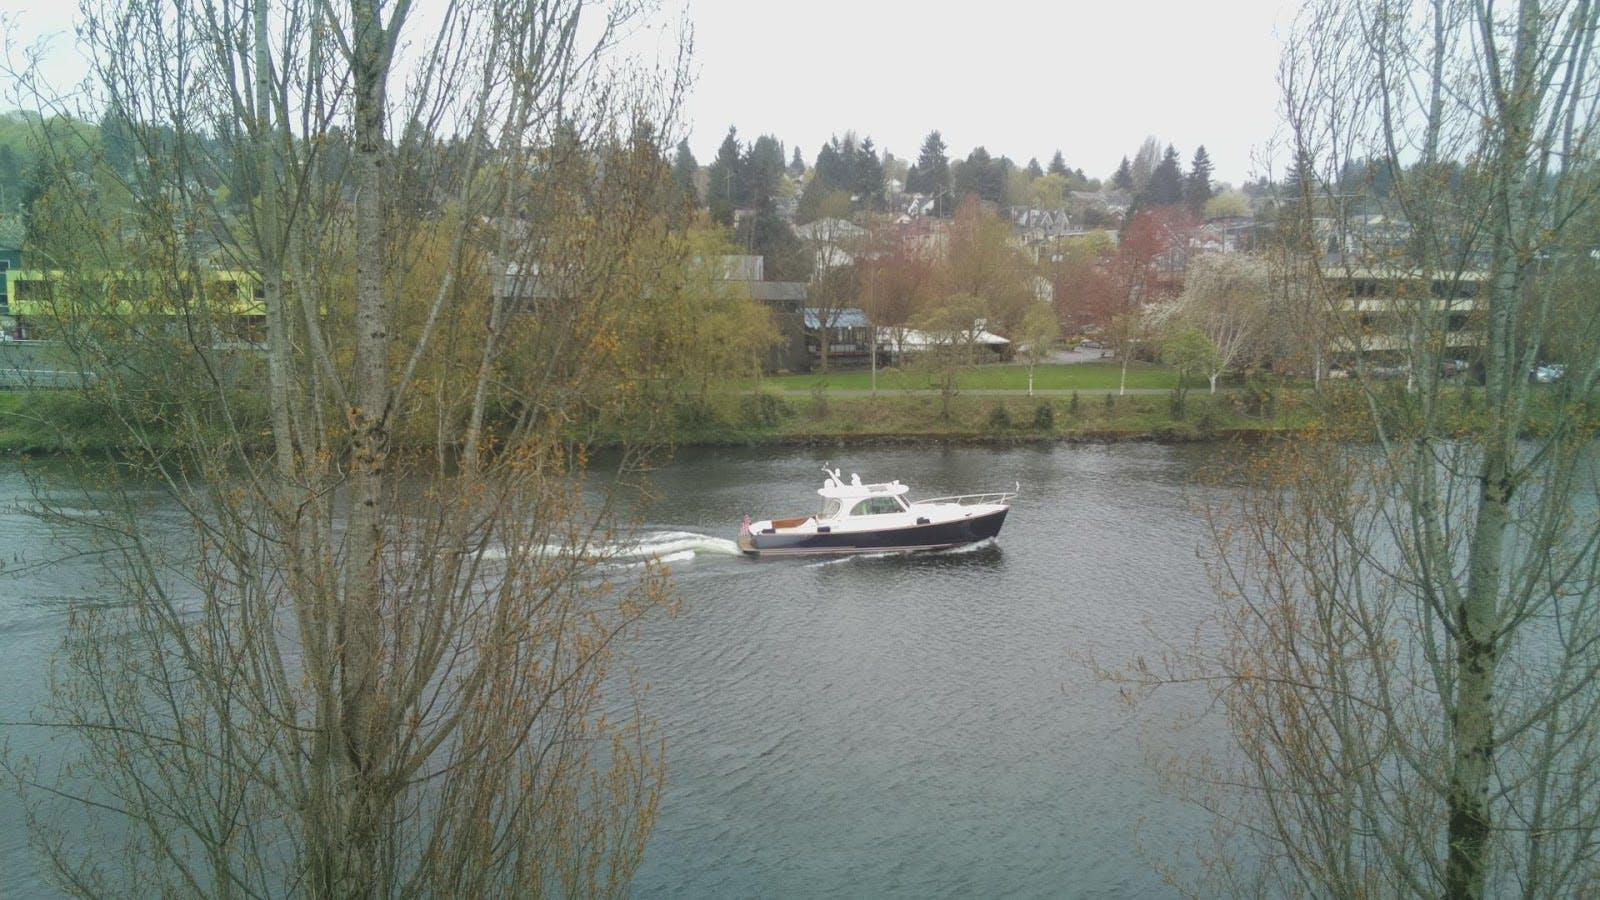 Result 0: lakeside/lakeshore (prob=0.441406 Result 1: canoe (prob=0.115173)